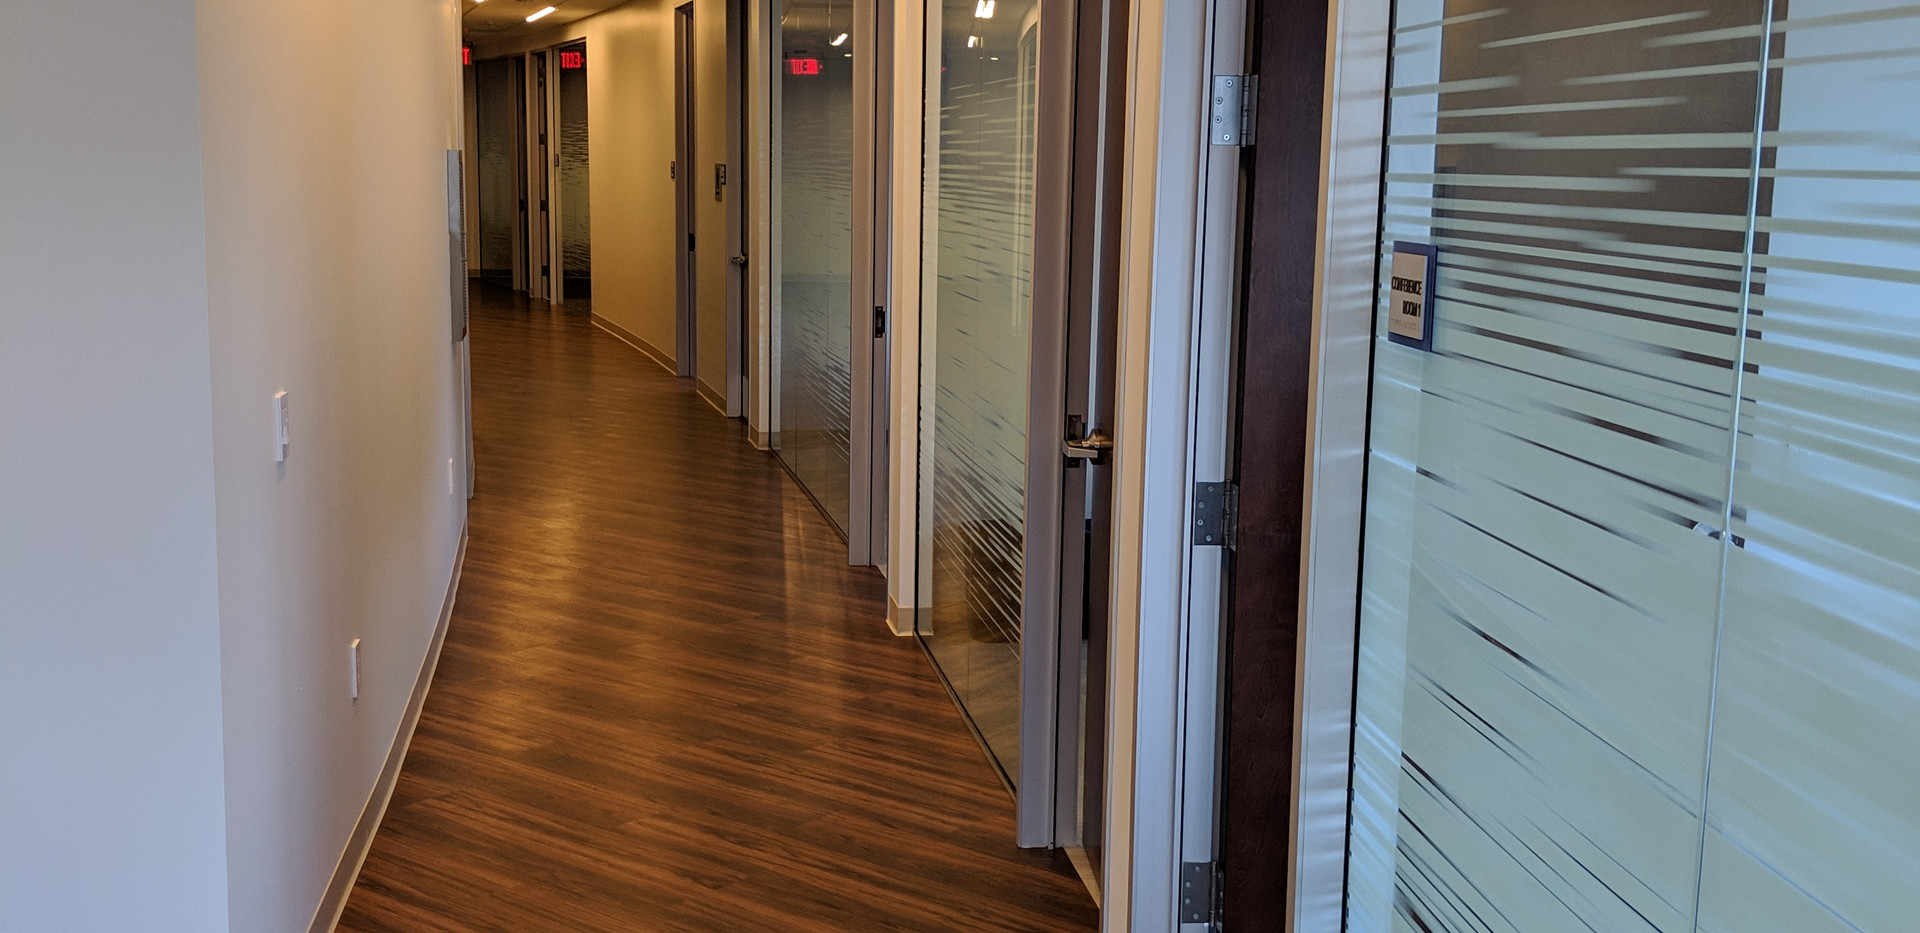 Hallway (3.20.19).jpg